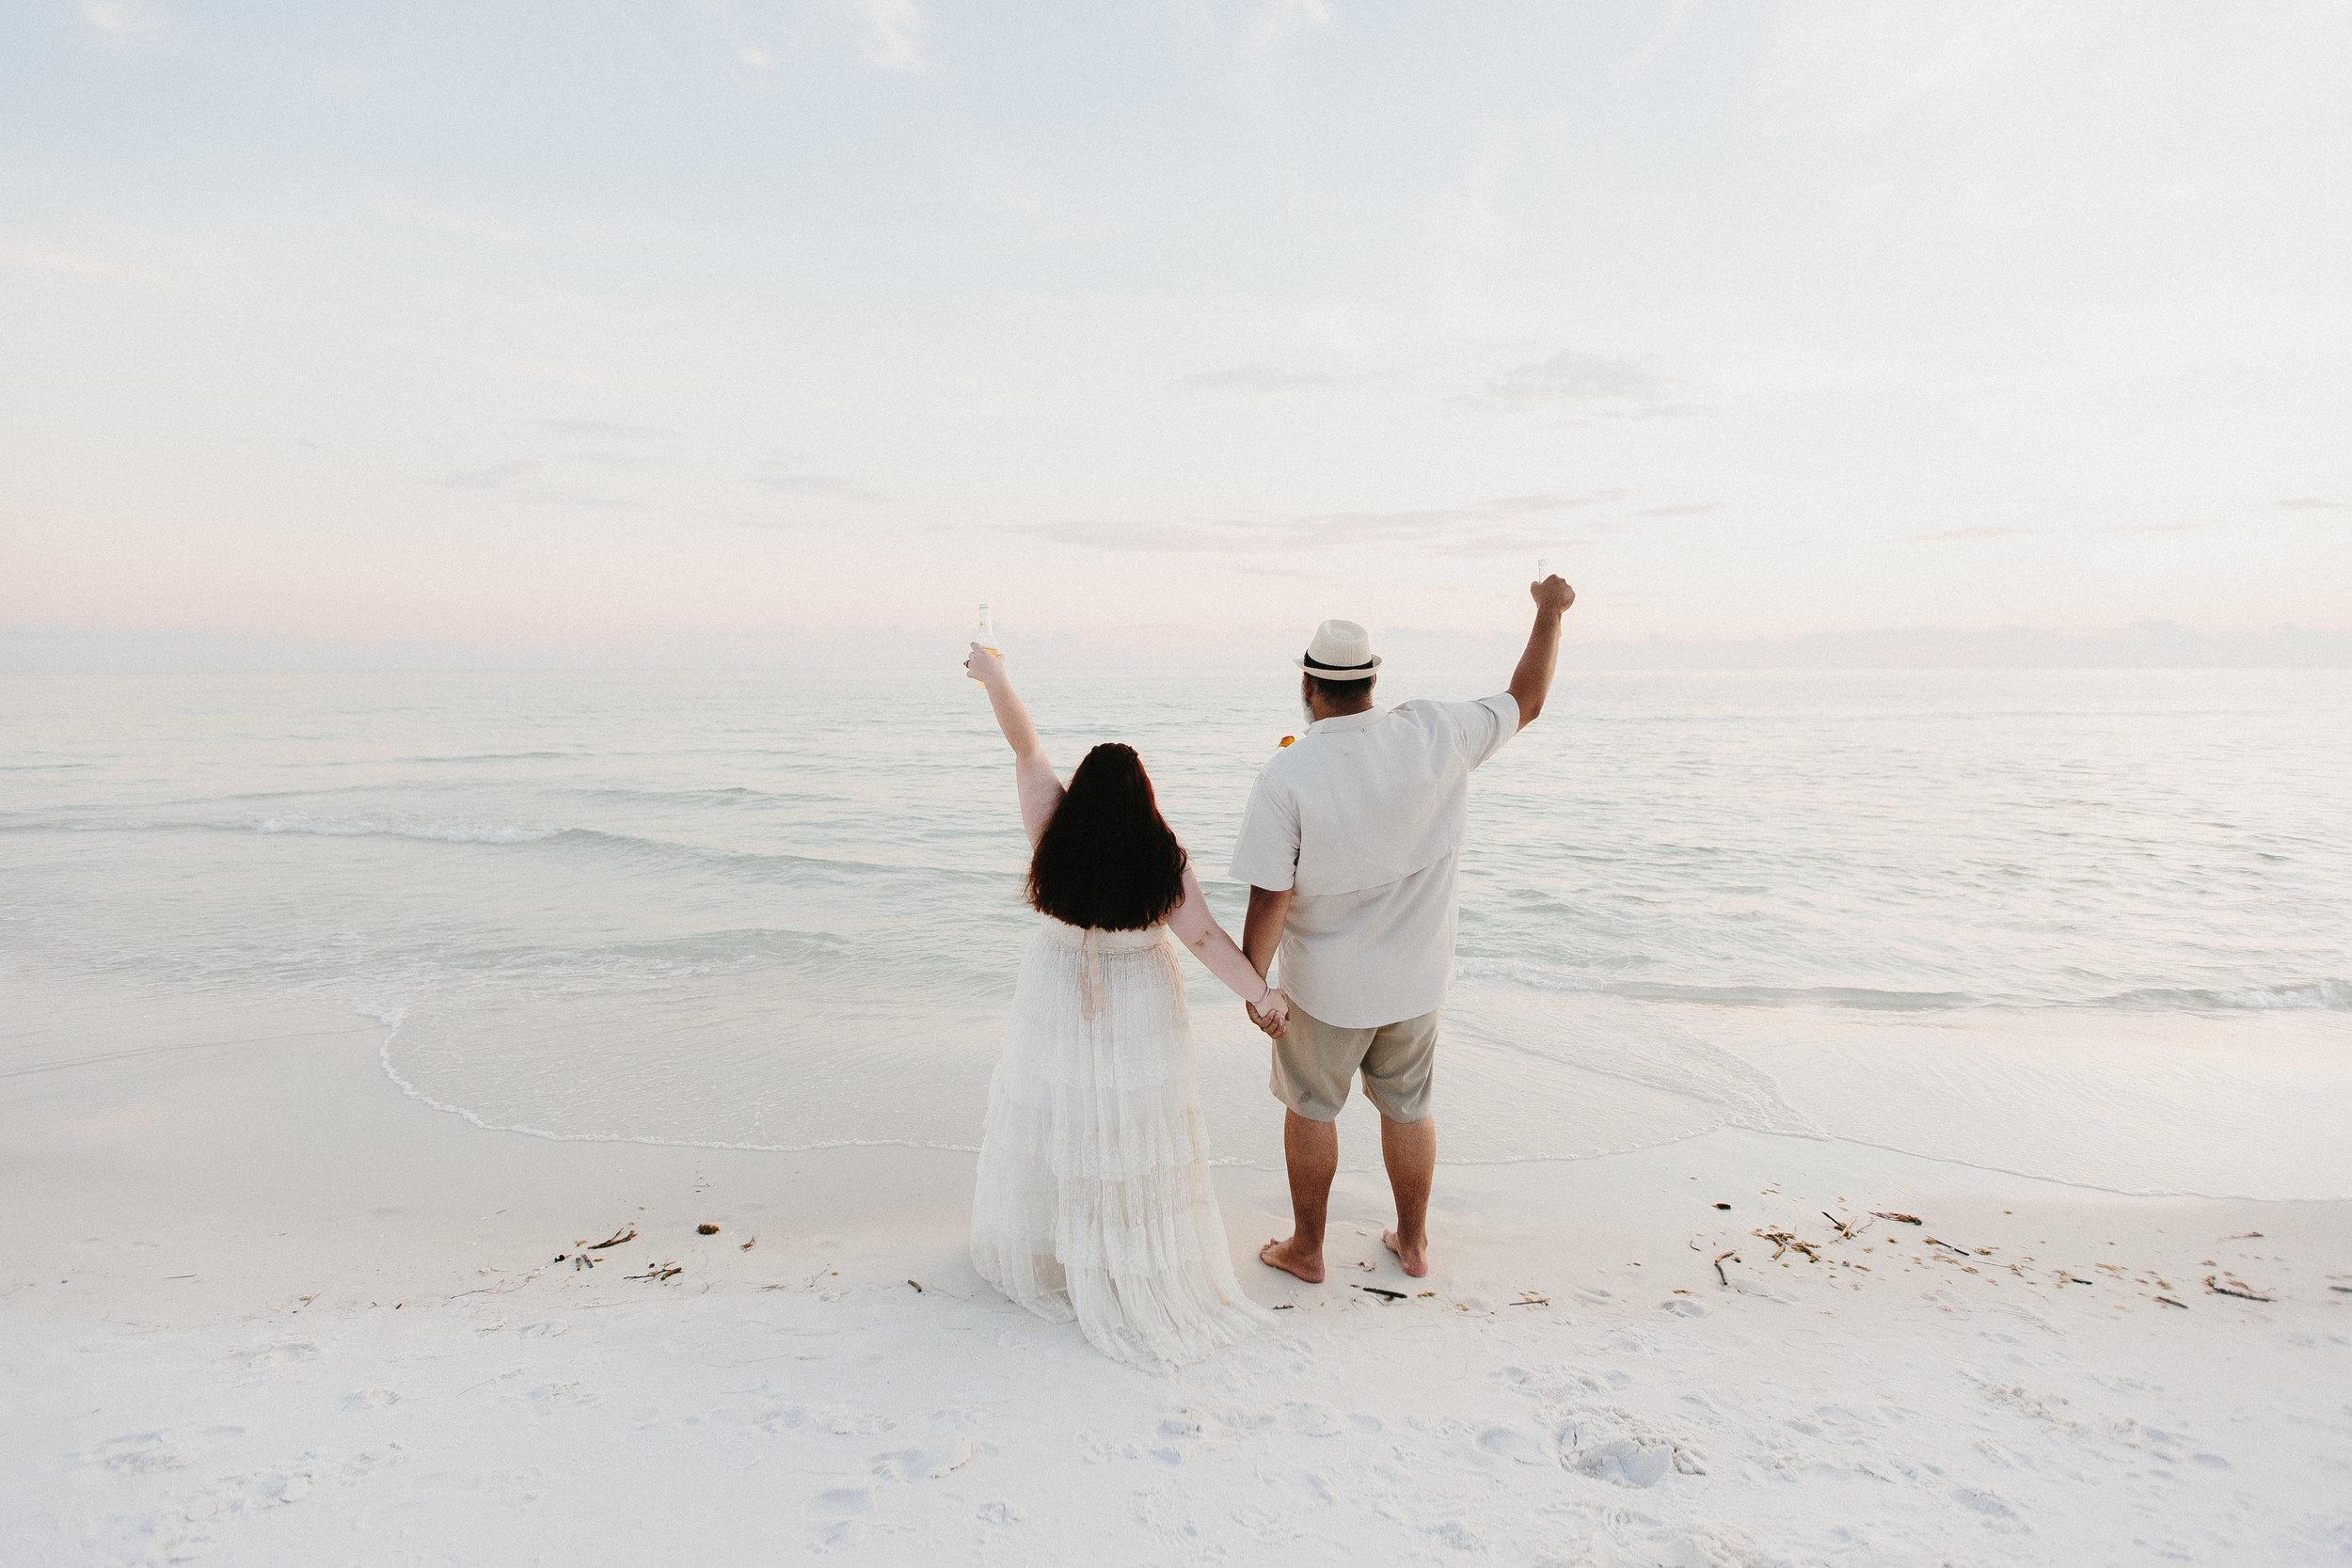 destin_sunset_beach_elopement_intimate_wedding_photographer_florida_documentary_1365.jpg